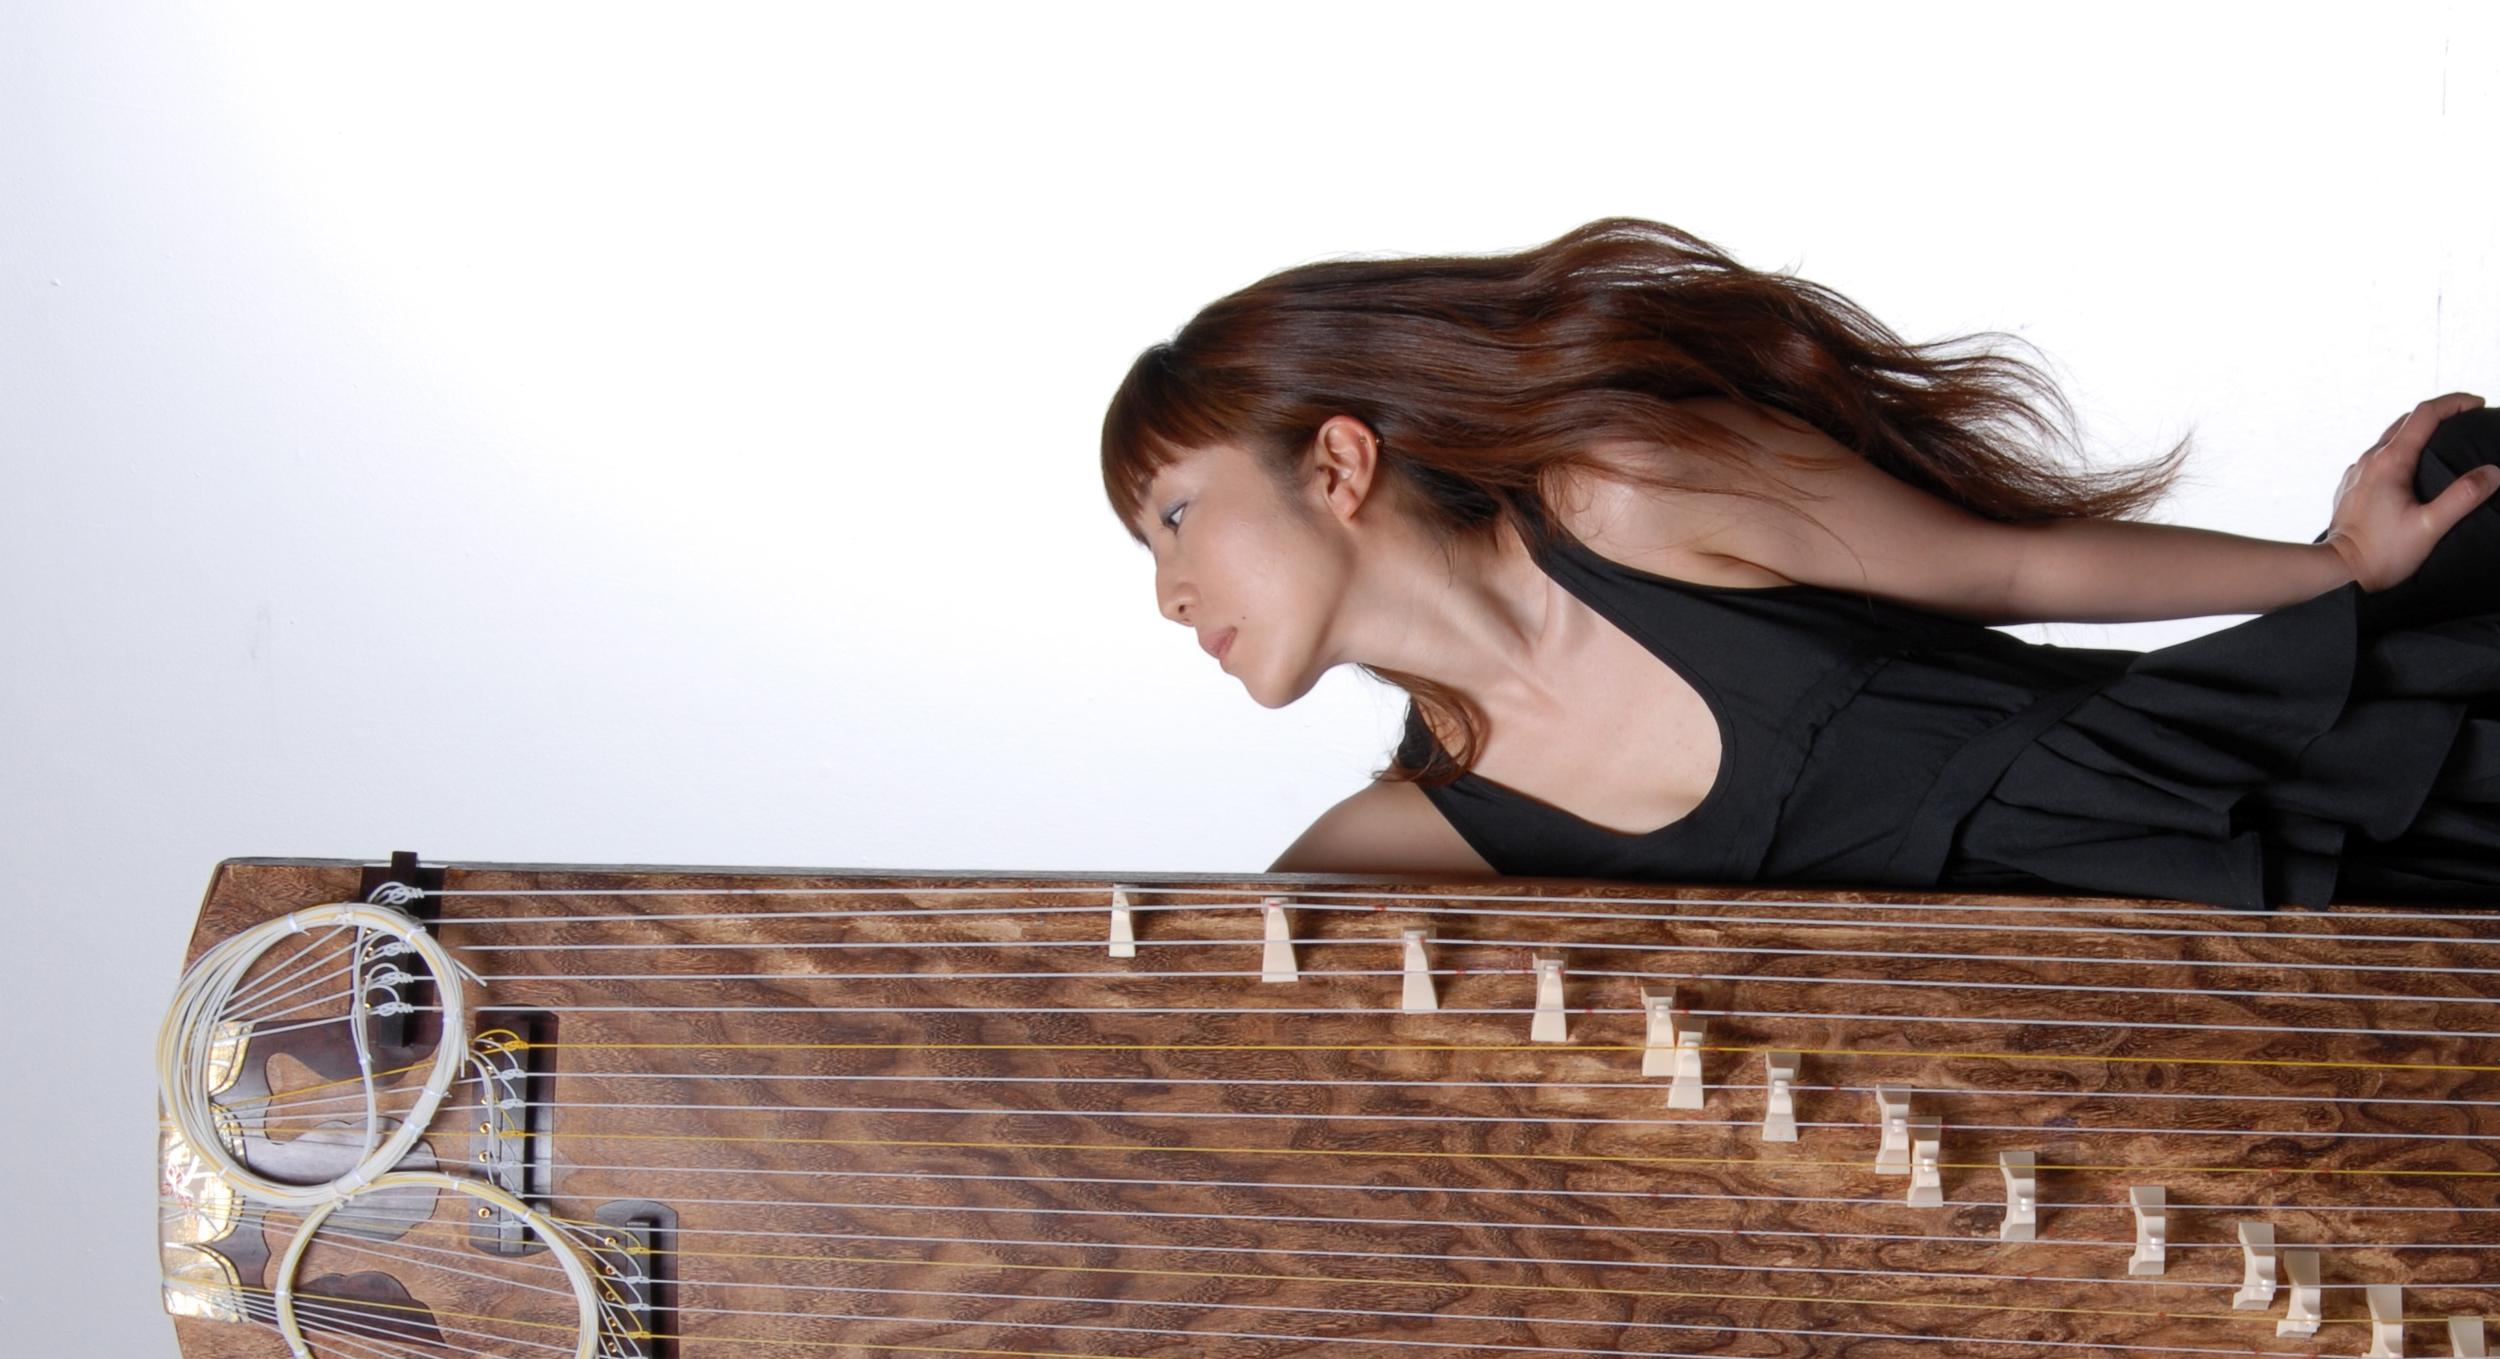 13 & 20-string Koto player / Composer / Improviser / Computer Sound Artist Yumi Kurosawa